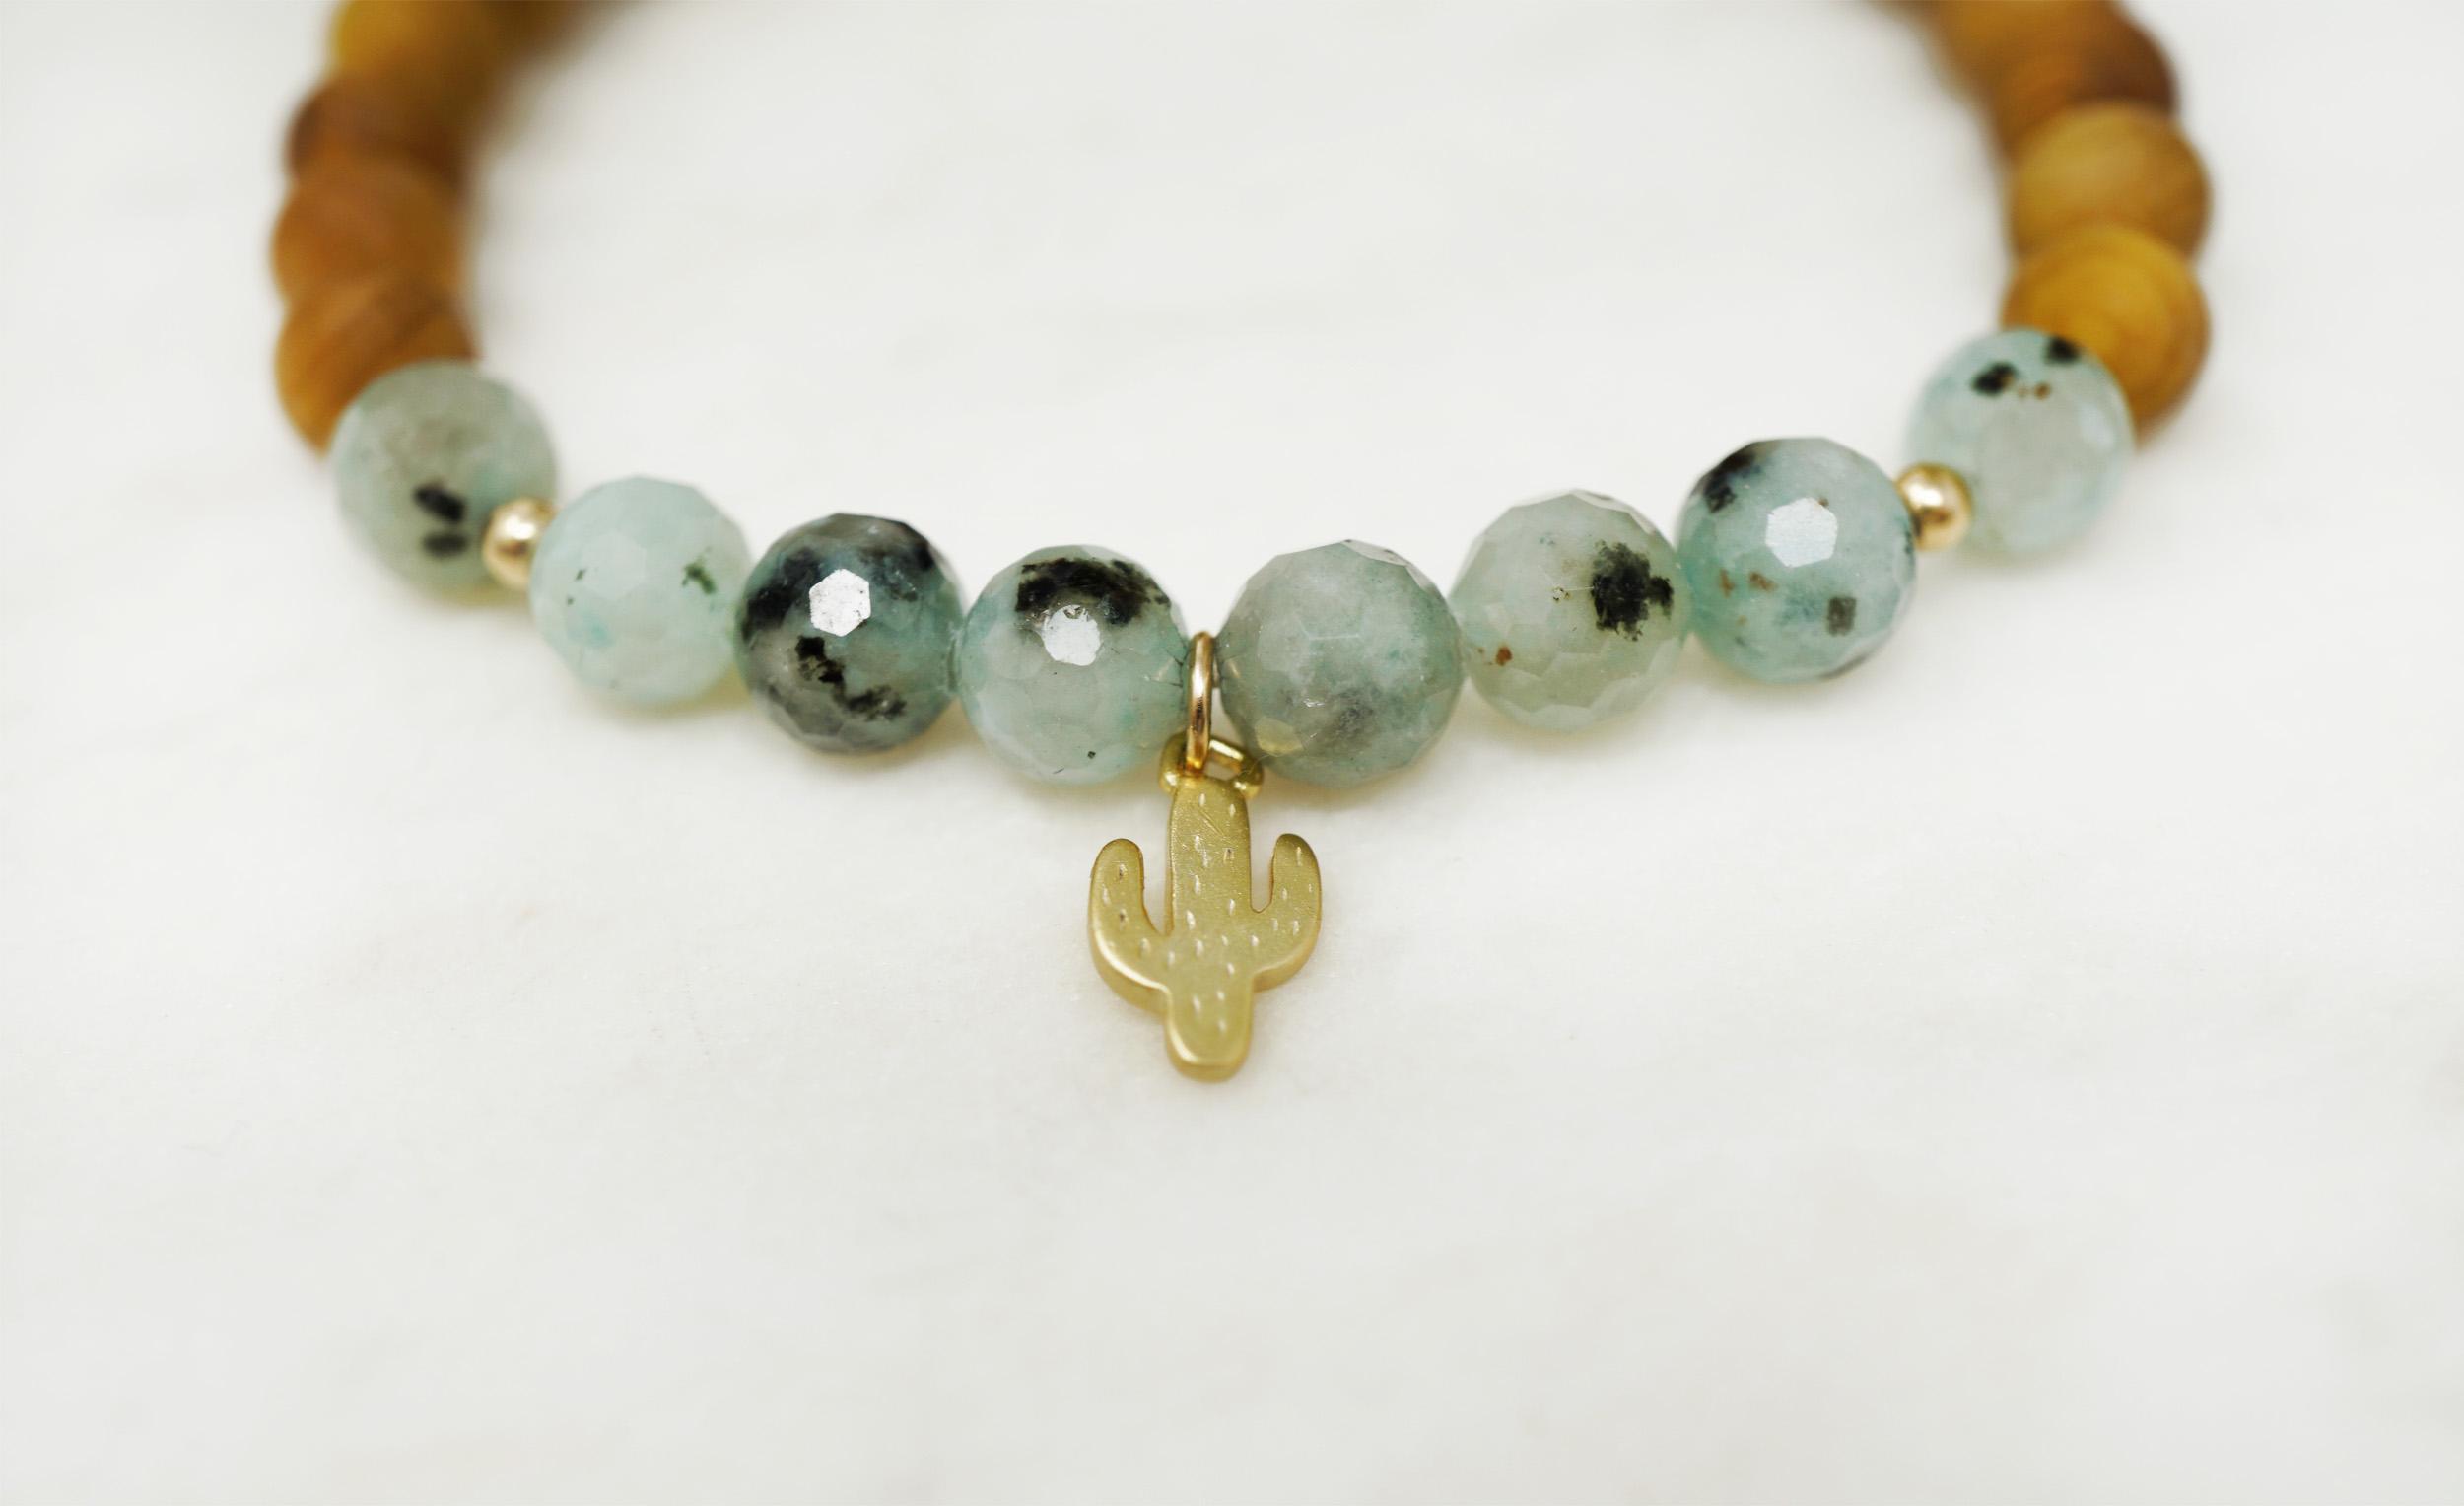 cactus kiwi jasper bracelet